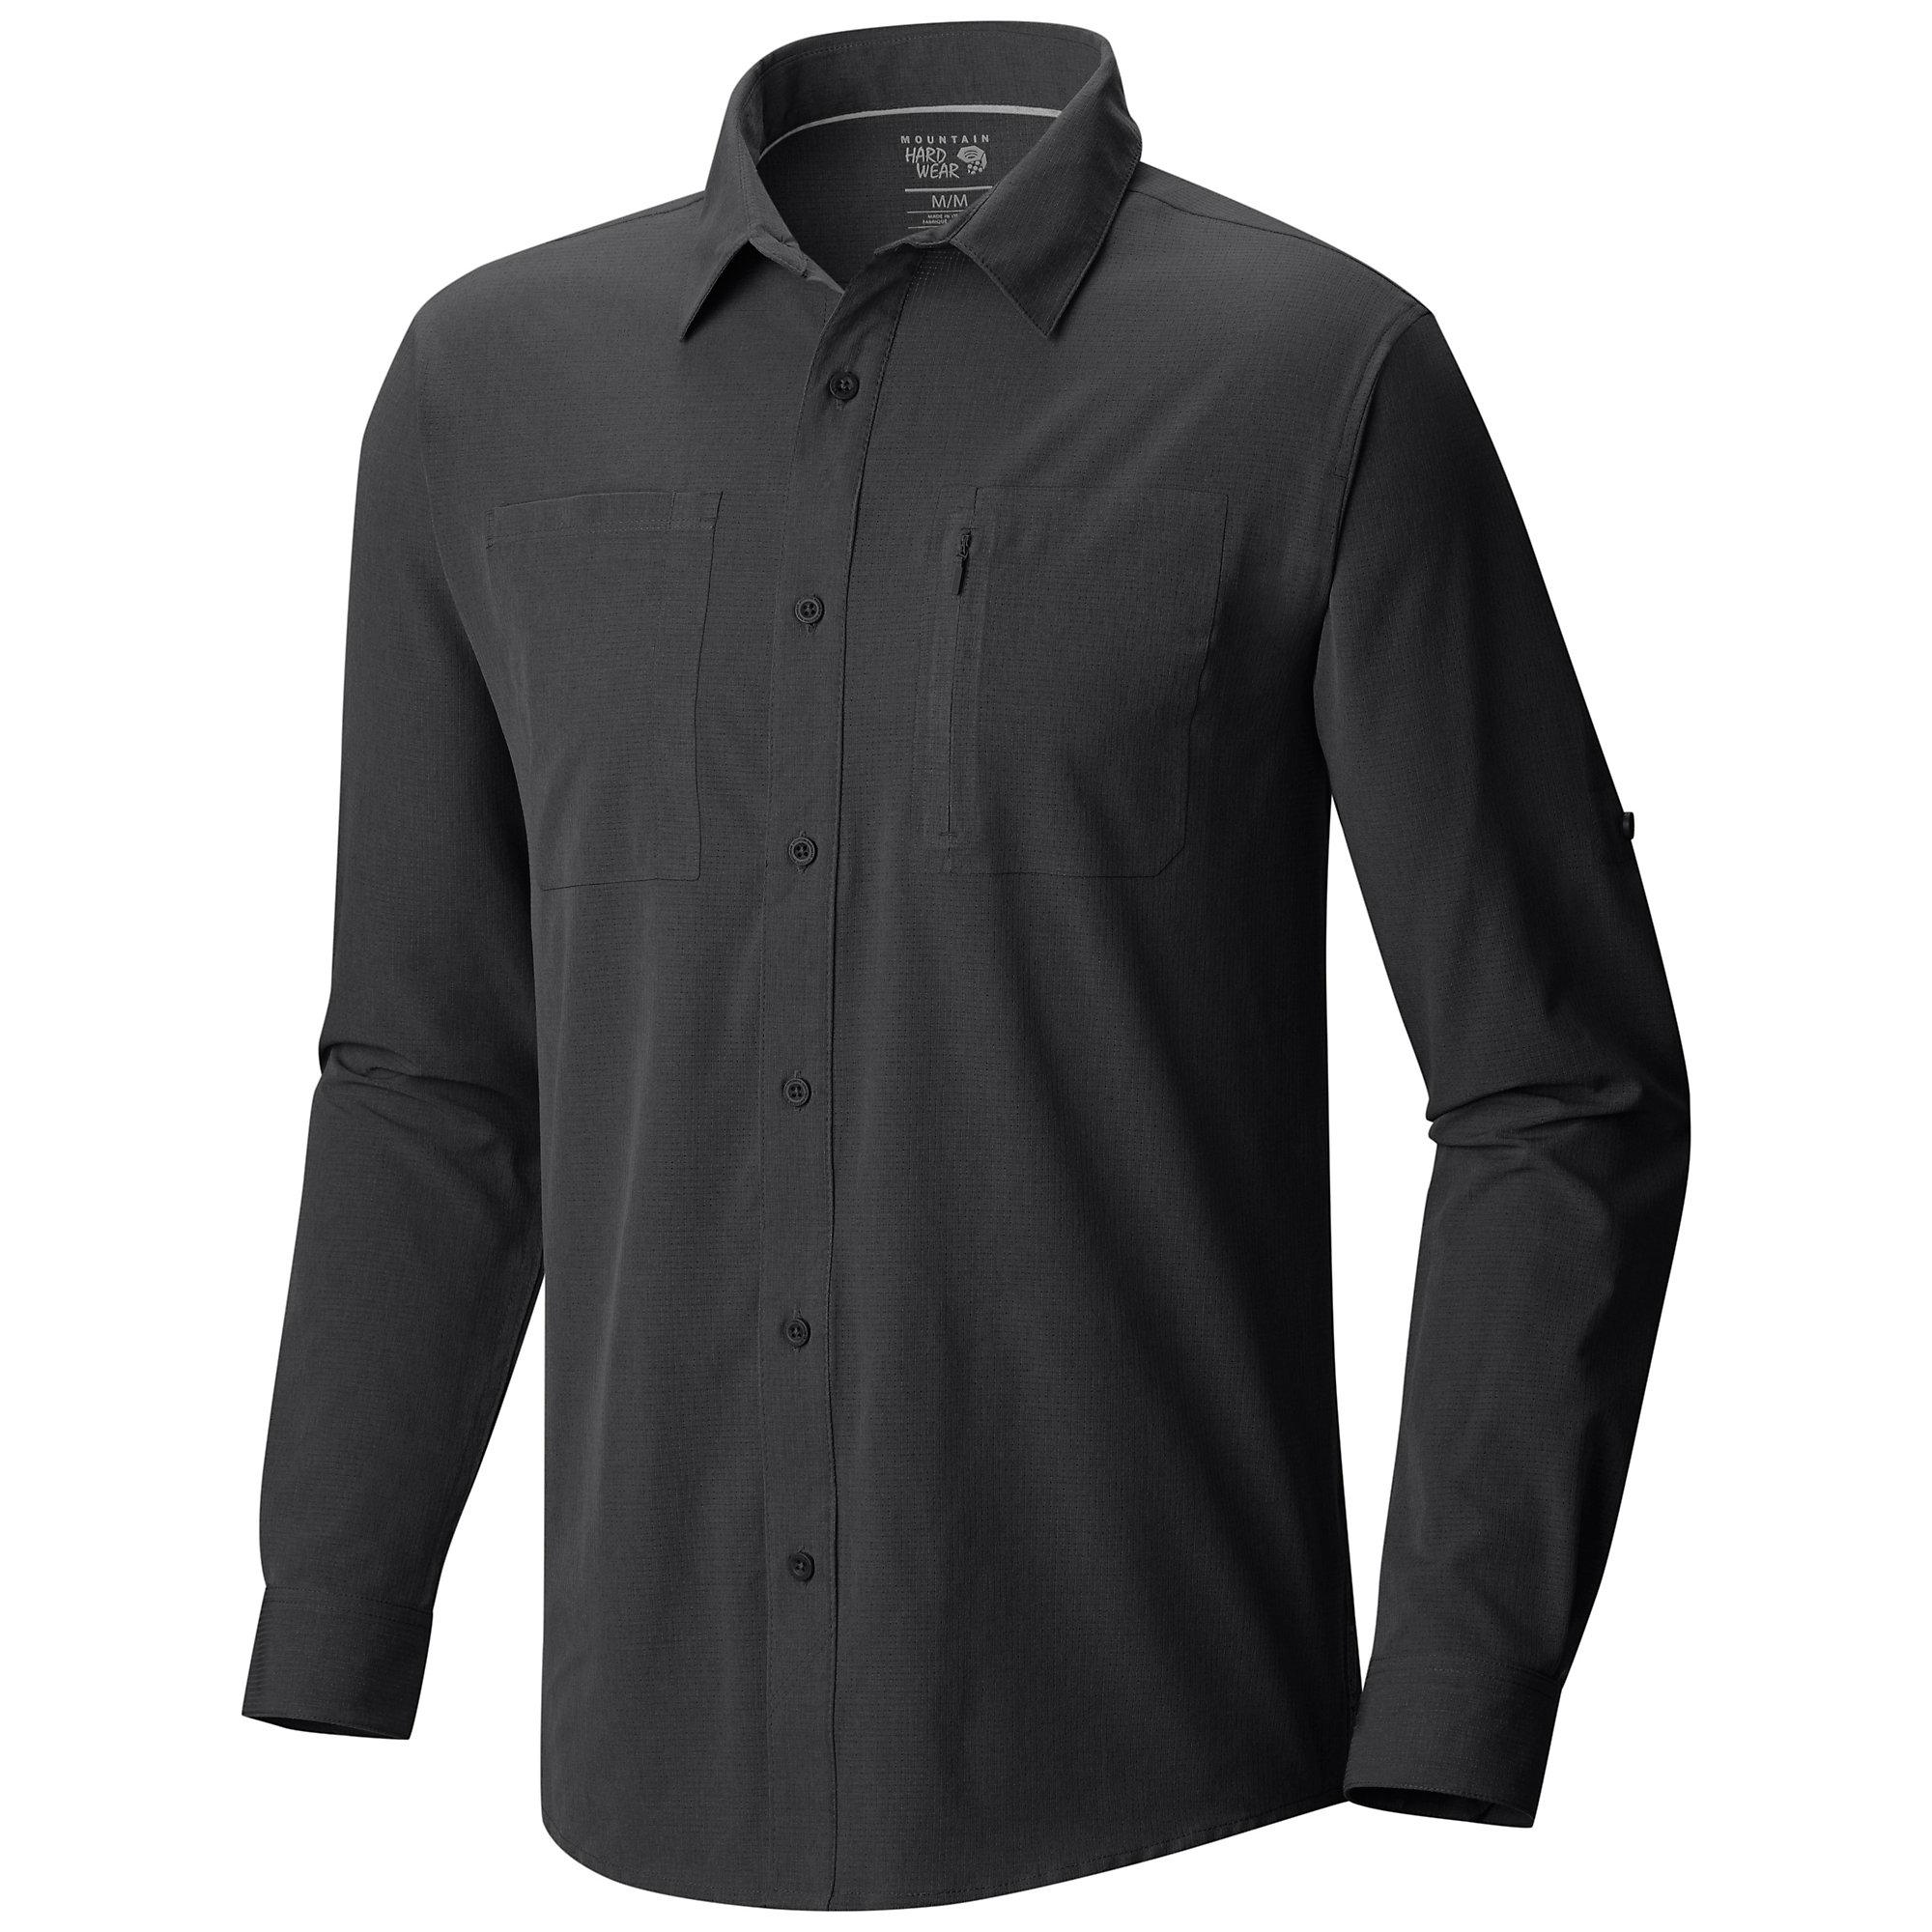 Mountain Hardwear Air Tech Long Sleeve Shirt